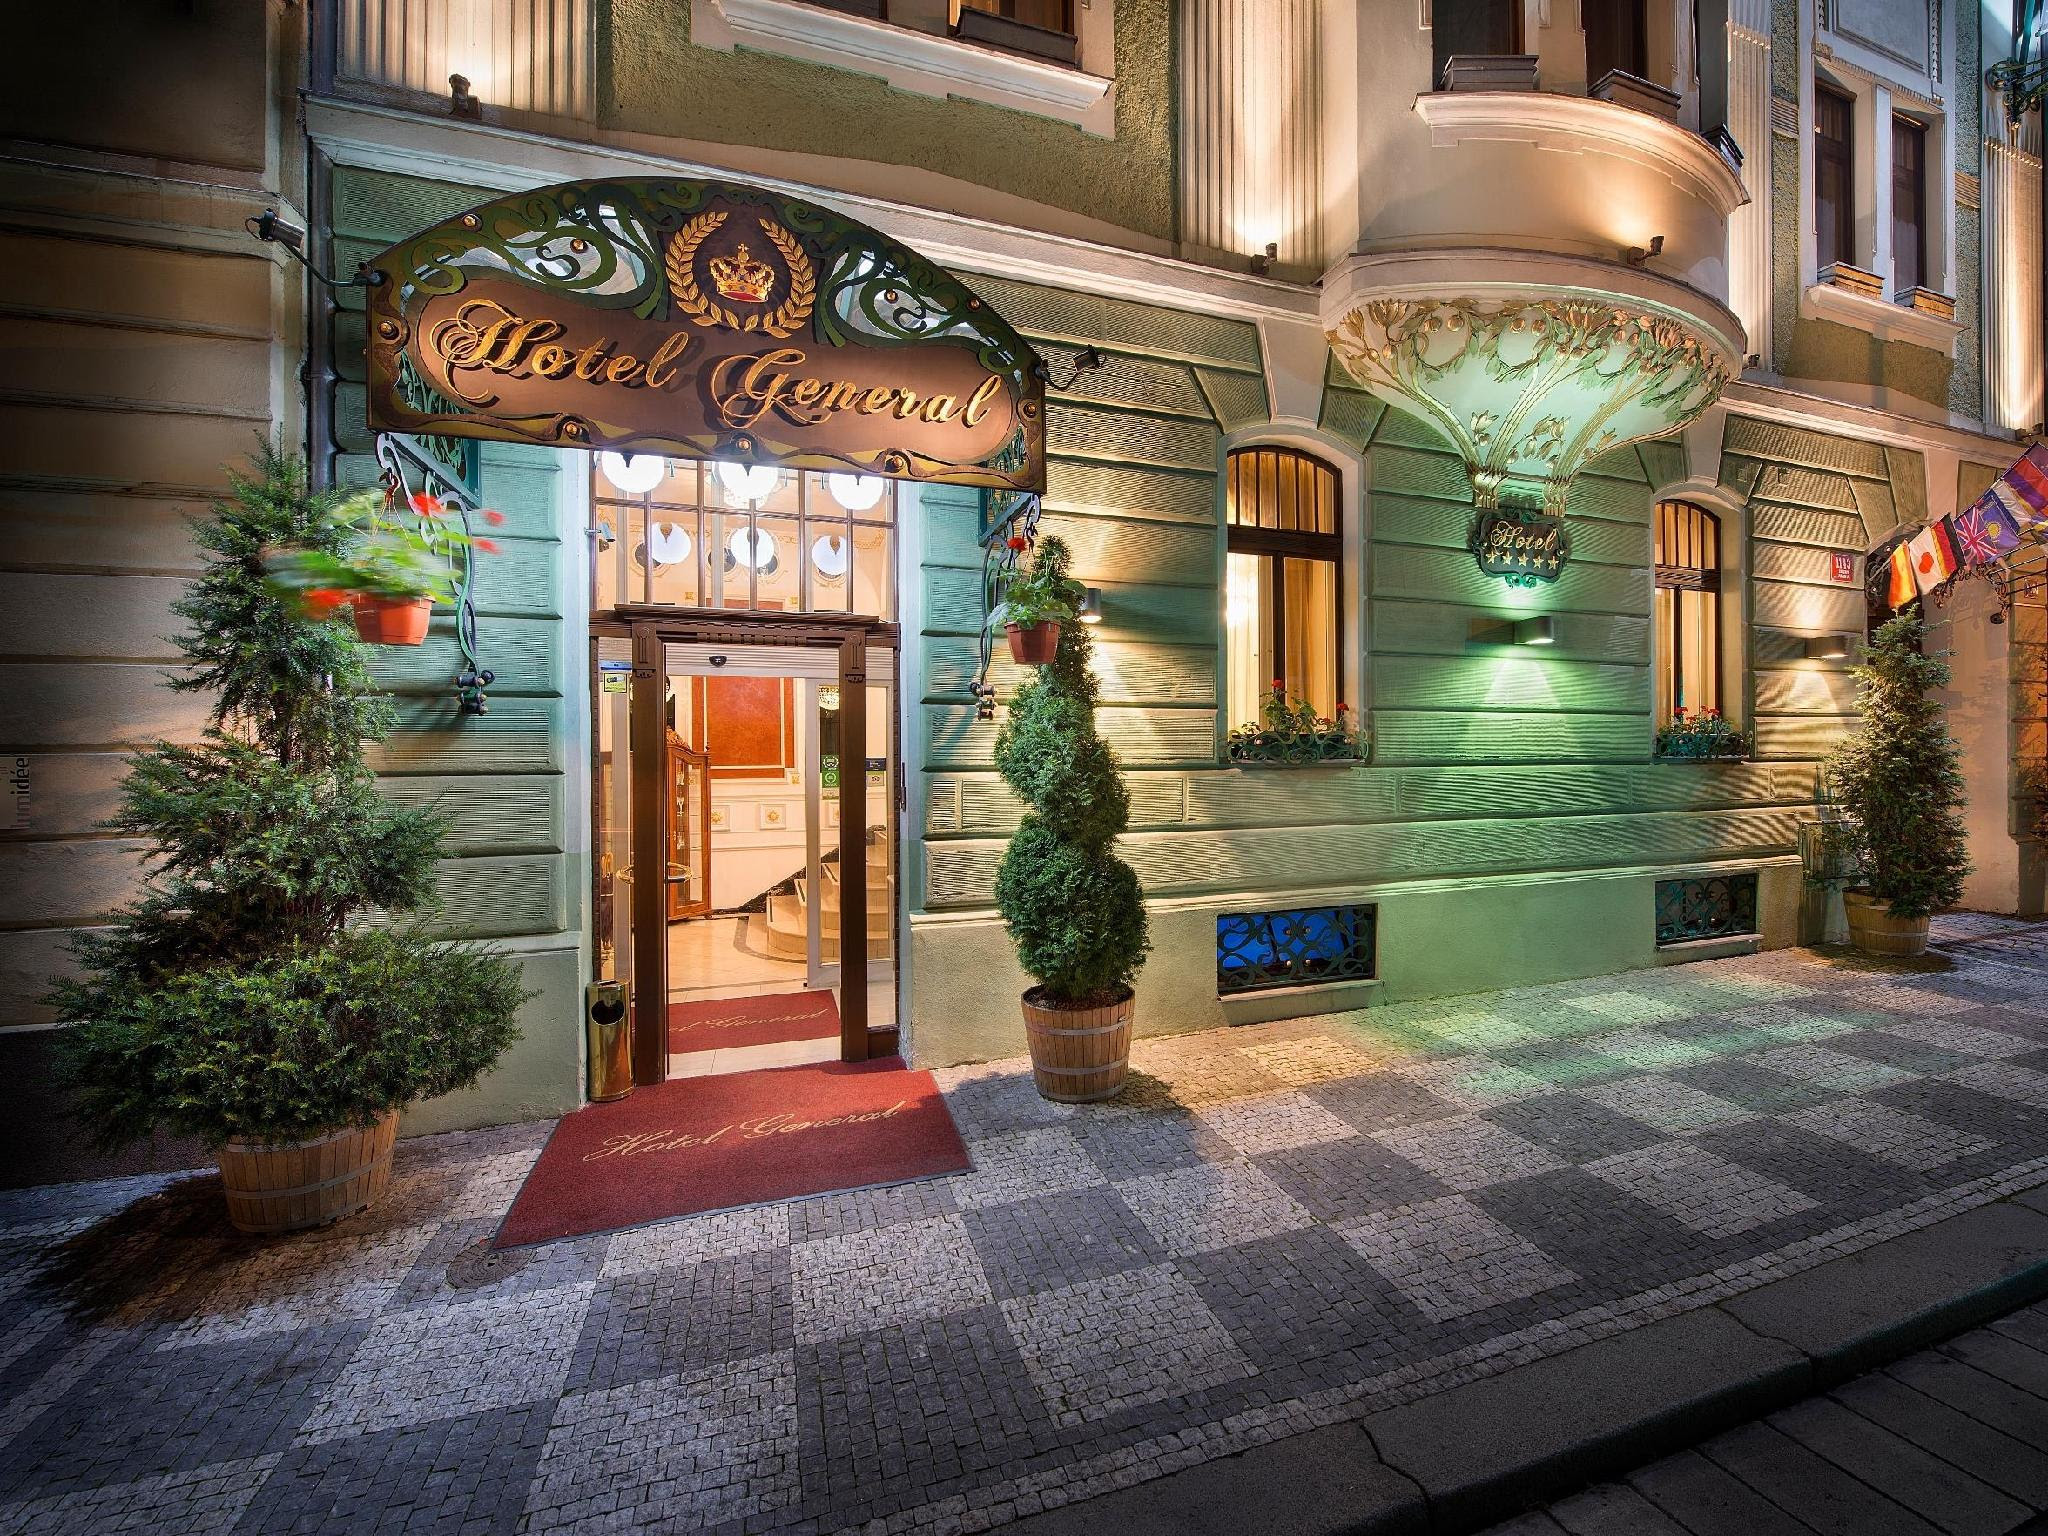 Hotel General Reviews